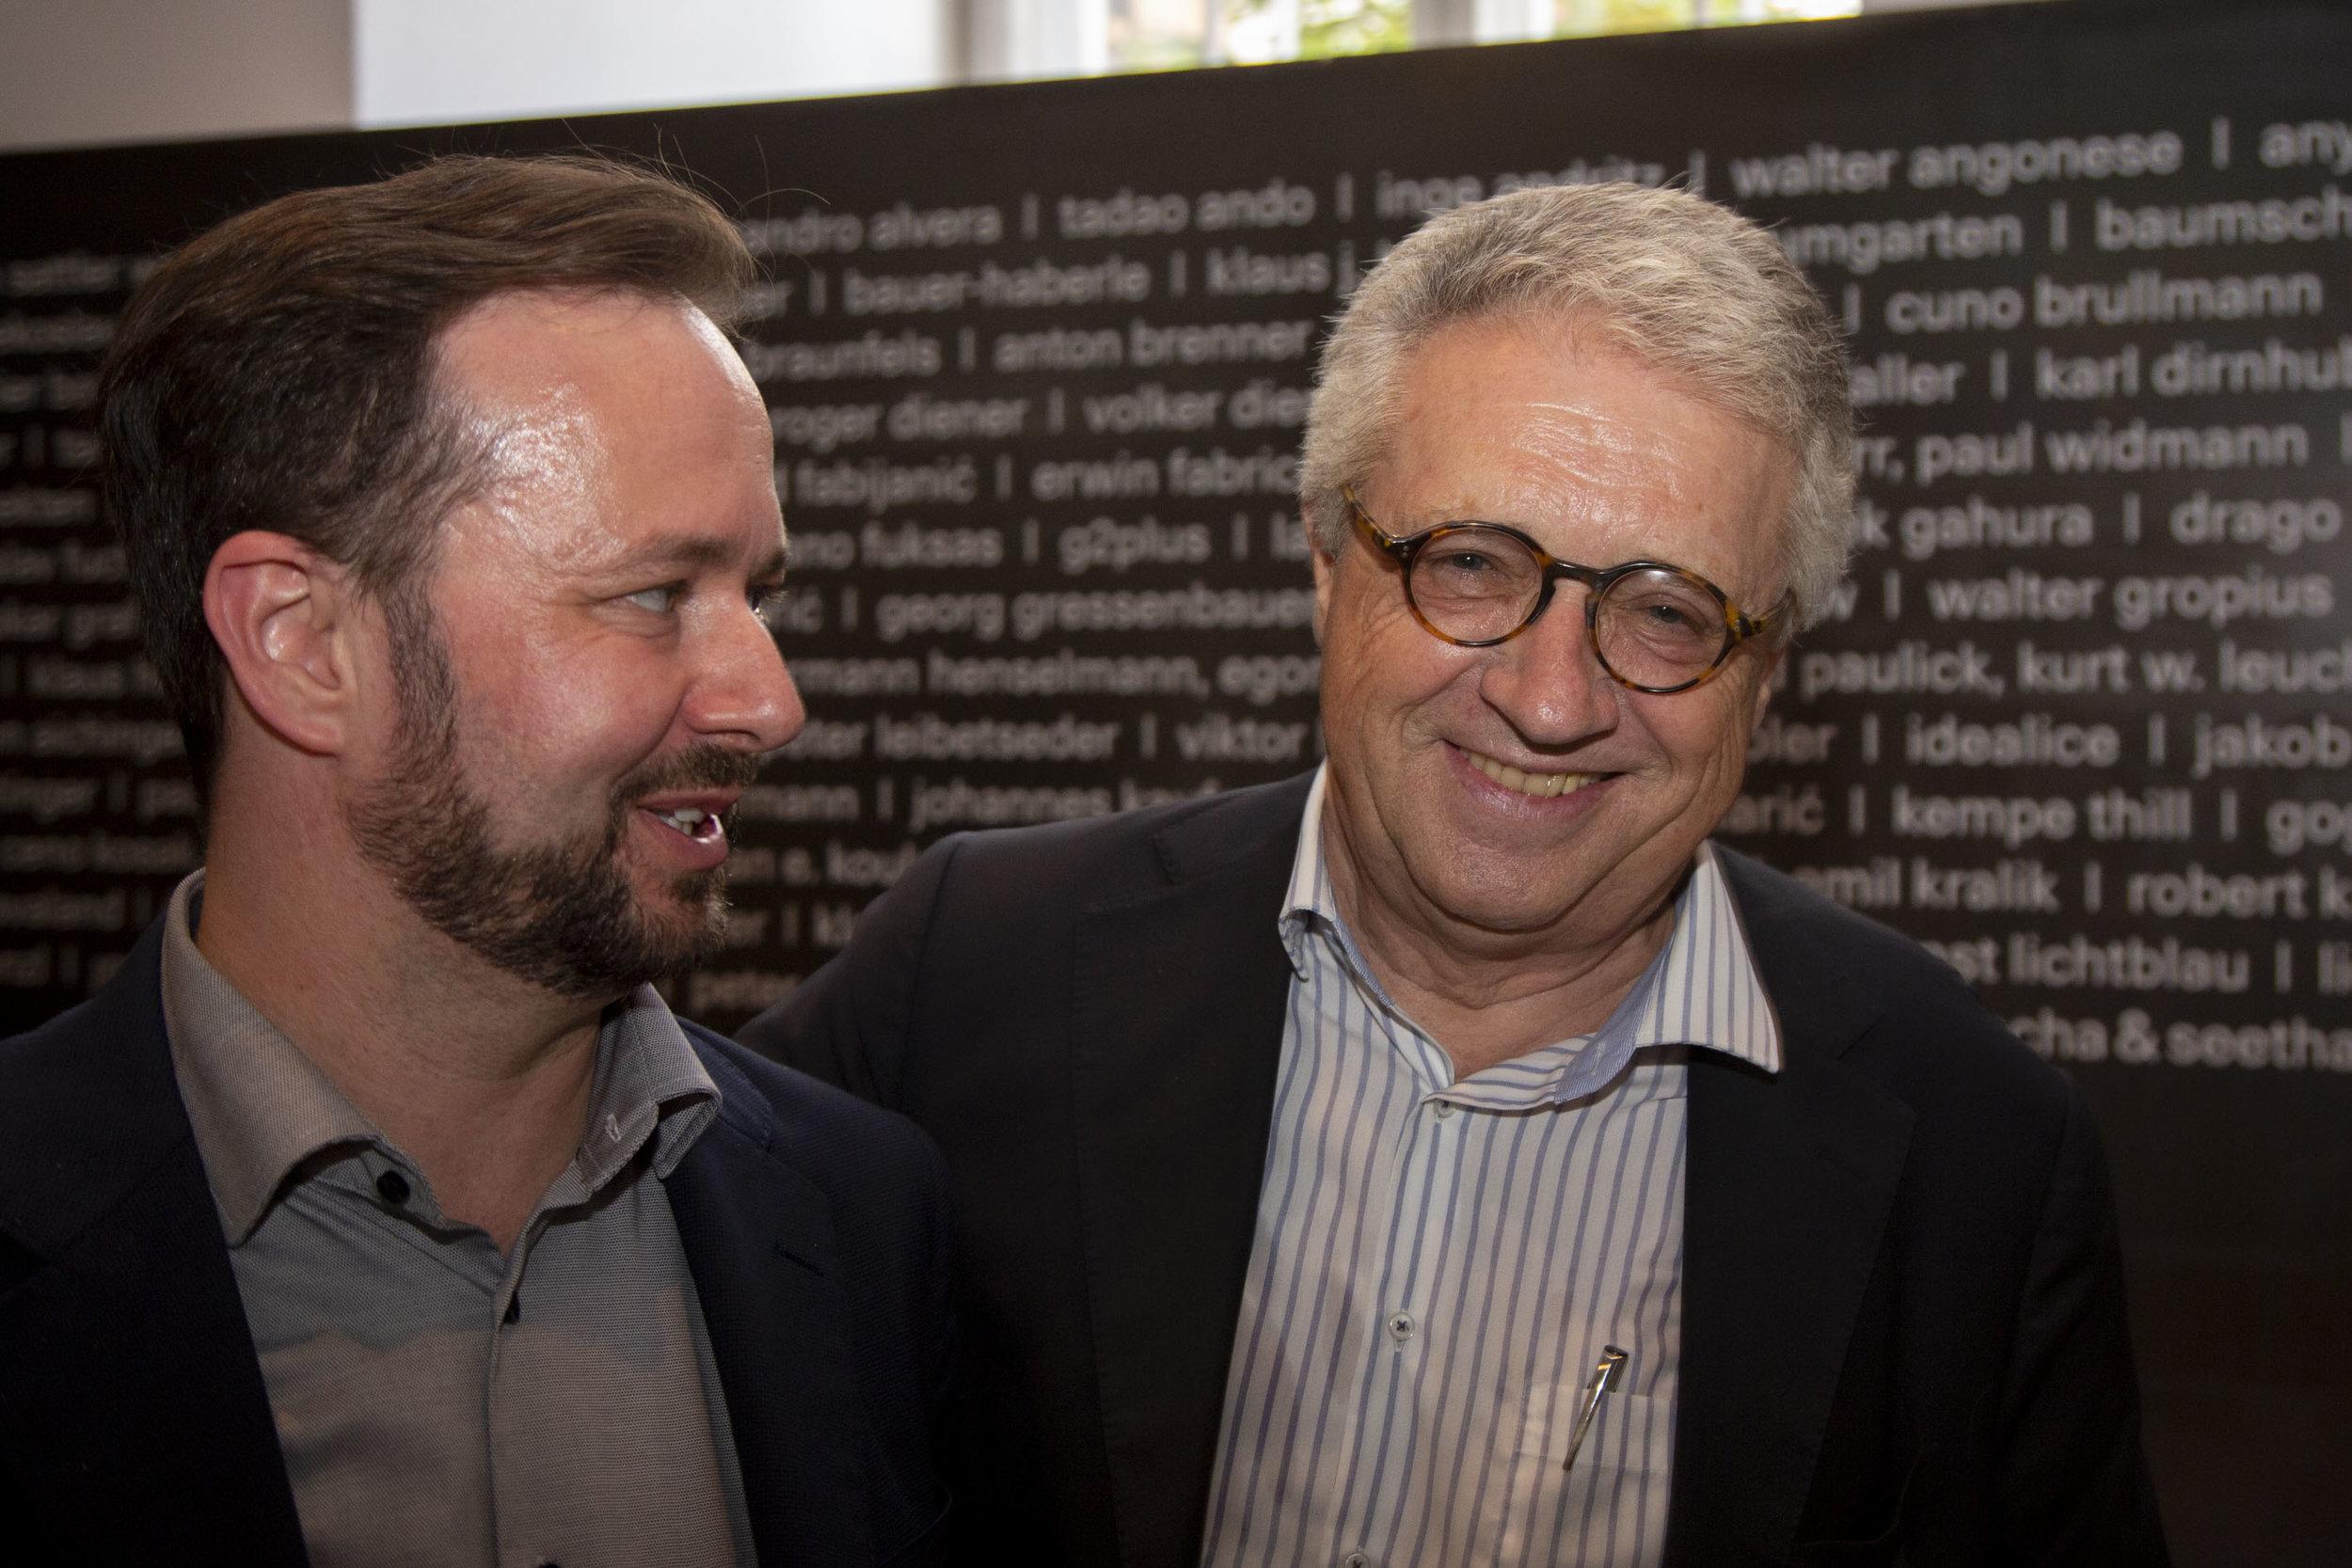 Dr. Markus Schweiger (left),  Executive Director, Austrian Marshall Plan Foundation,  Ambassador Wolfgang Petritsch,  President, Austrian Marshall Plan Foundation